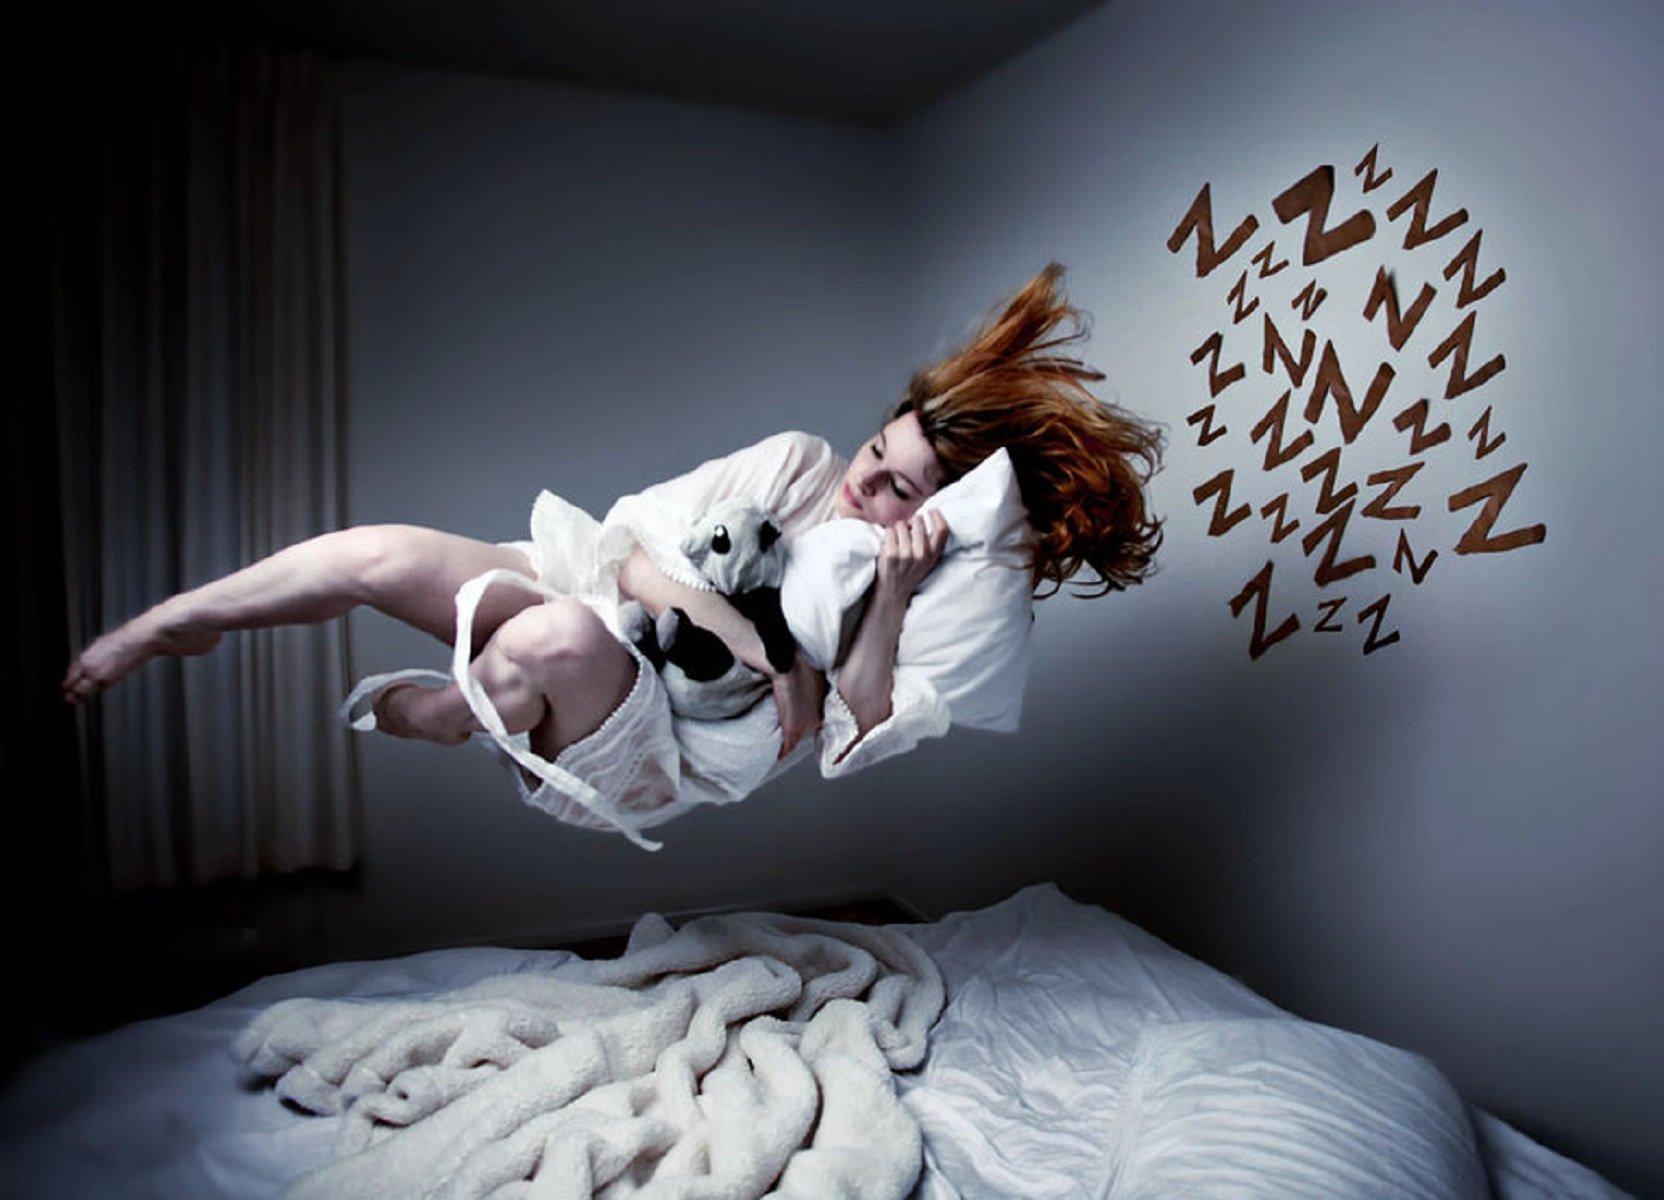 видеть во сне много фотографий